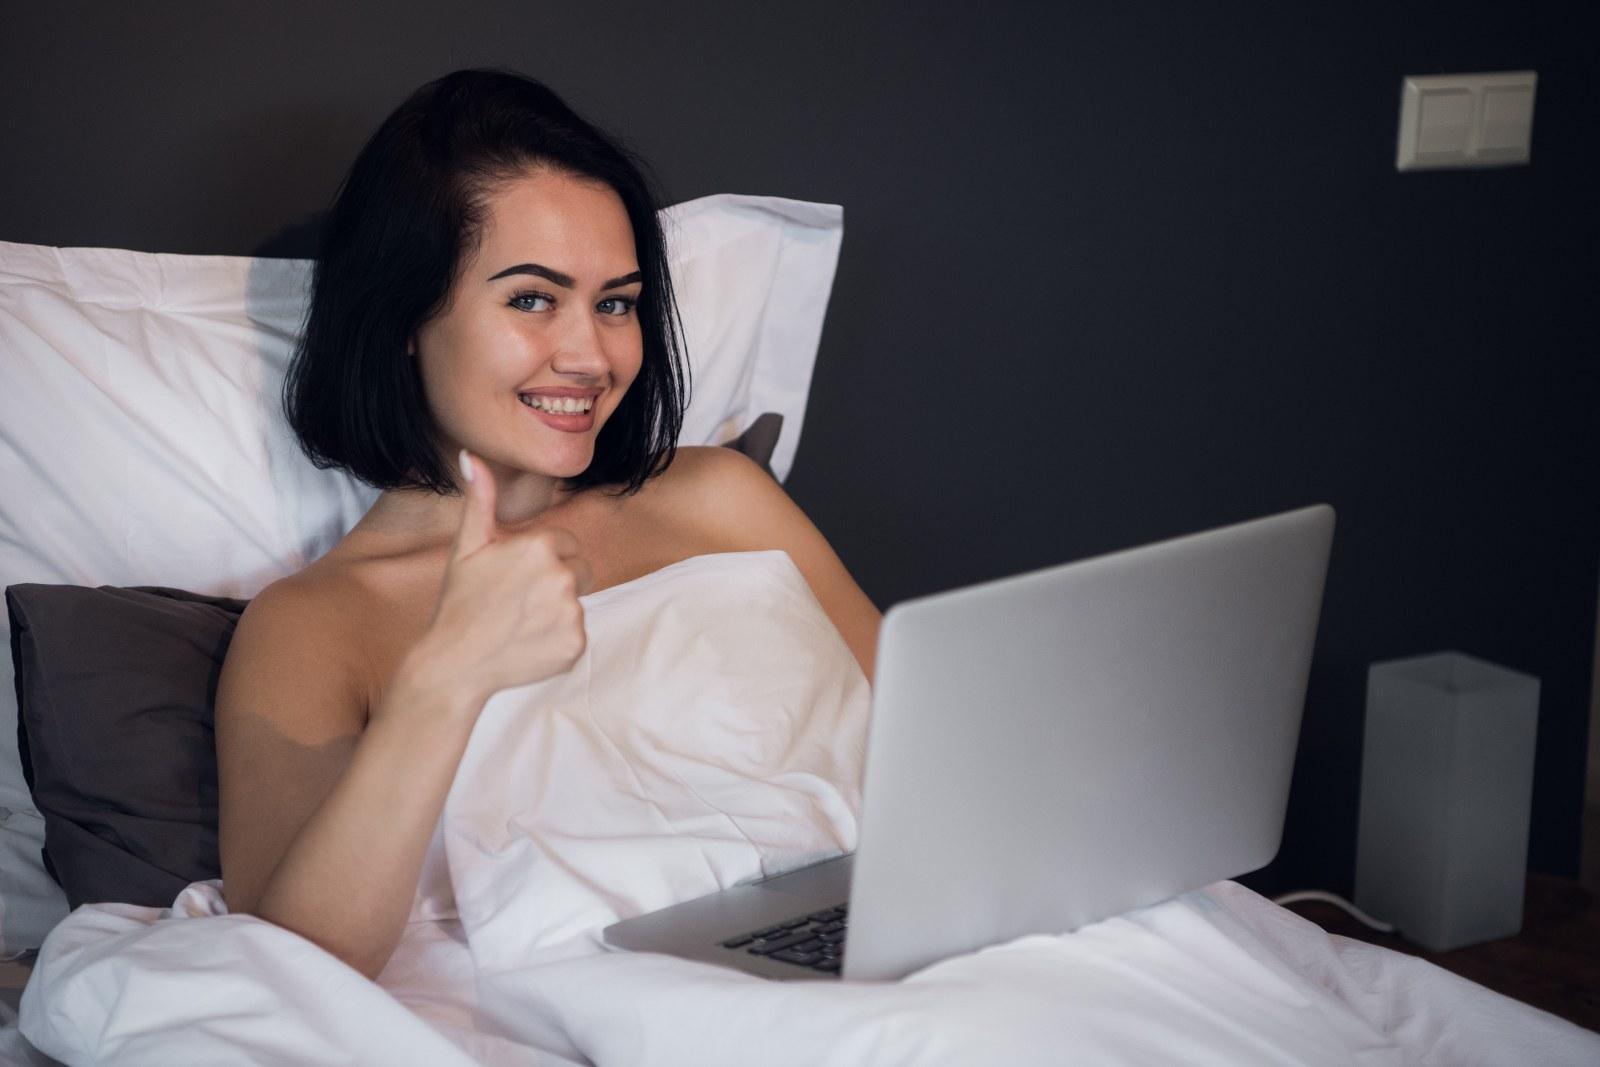 model viceochat webcam angajare